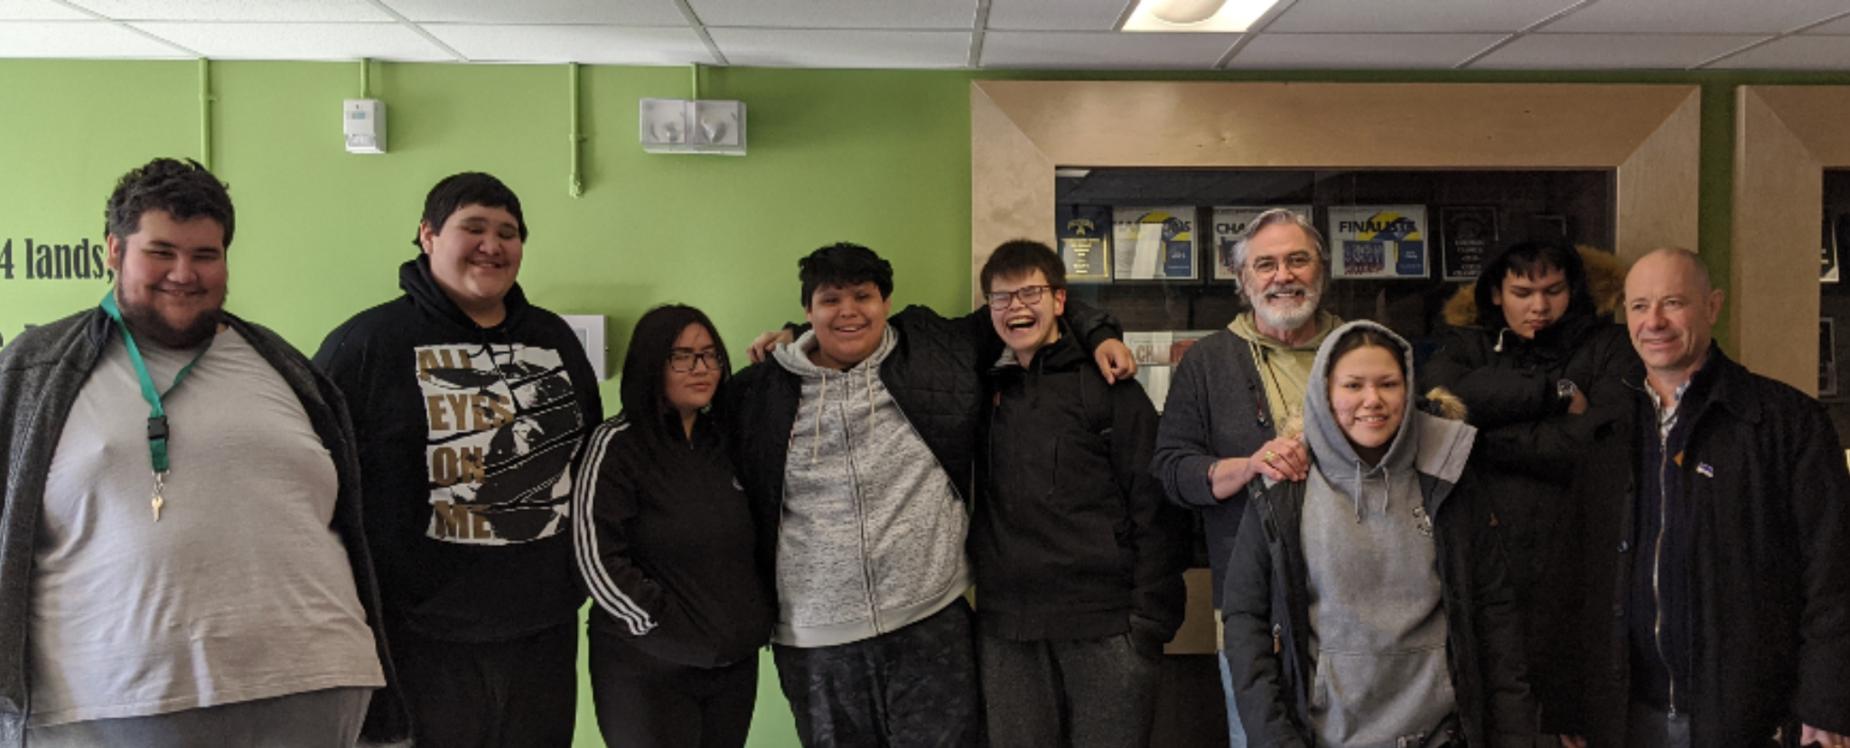 students with David Bouchard